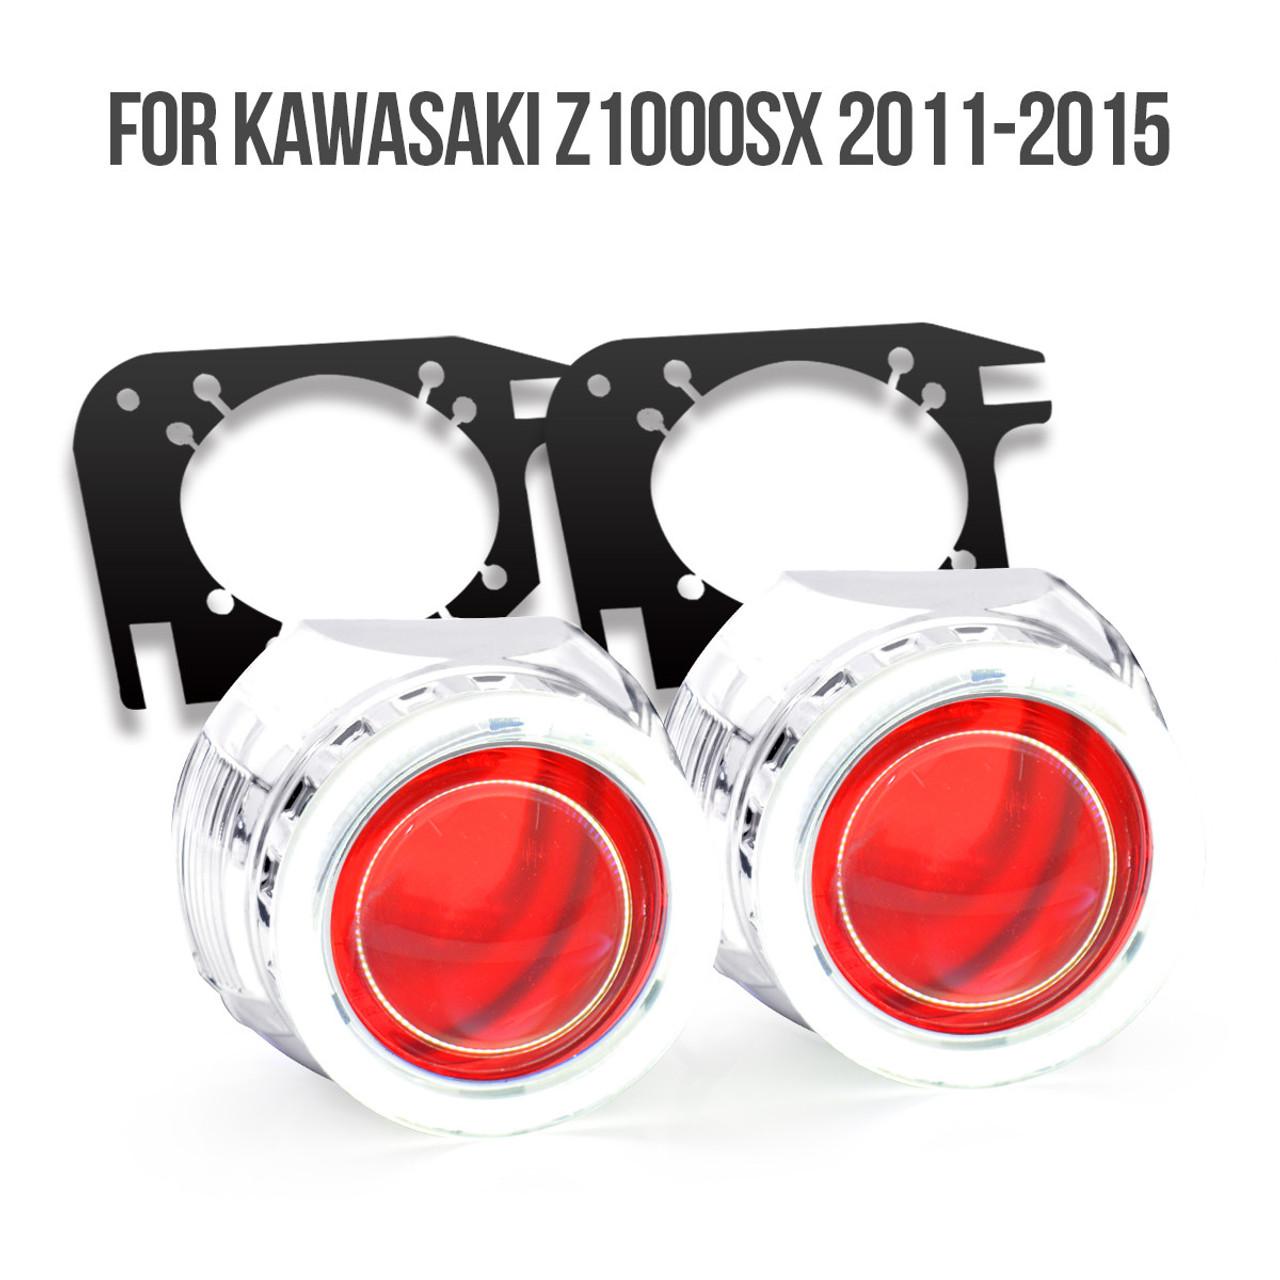 Kawasaki Ninja 1000 Hid Projector Kit 2011 2012 2013 2014 2015 2016 250 Wiring Harness